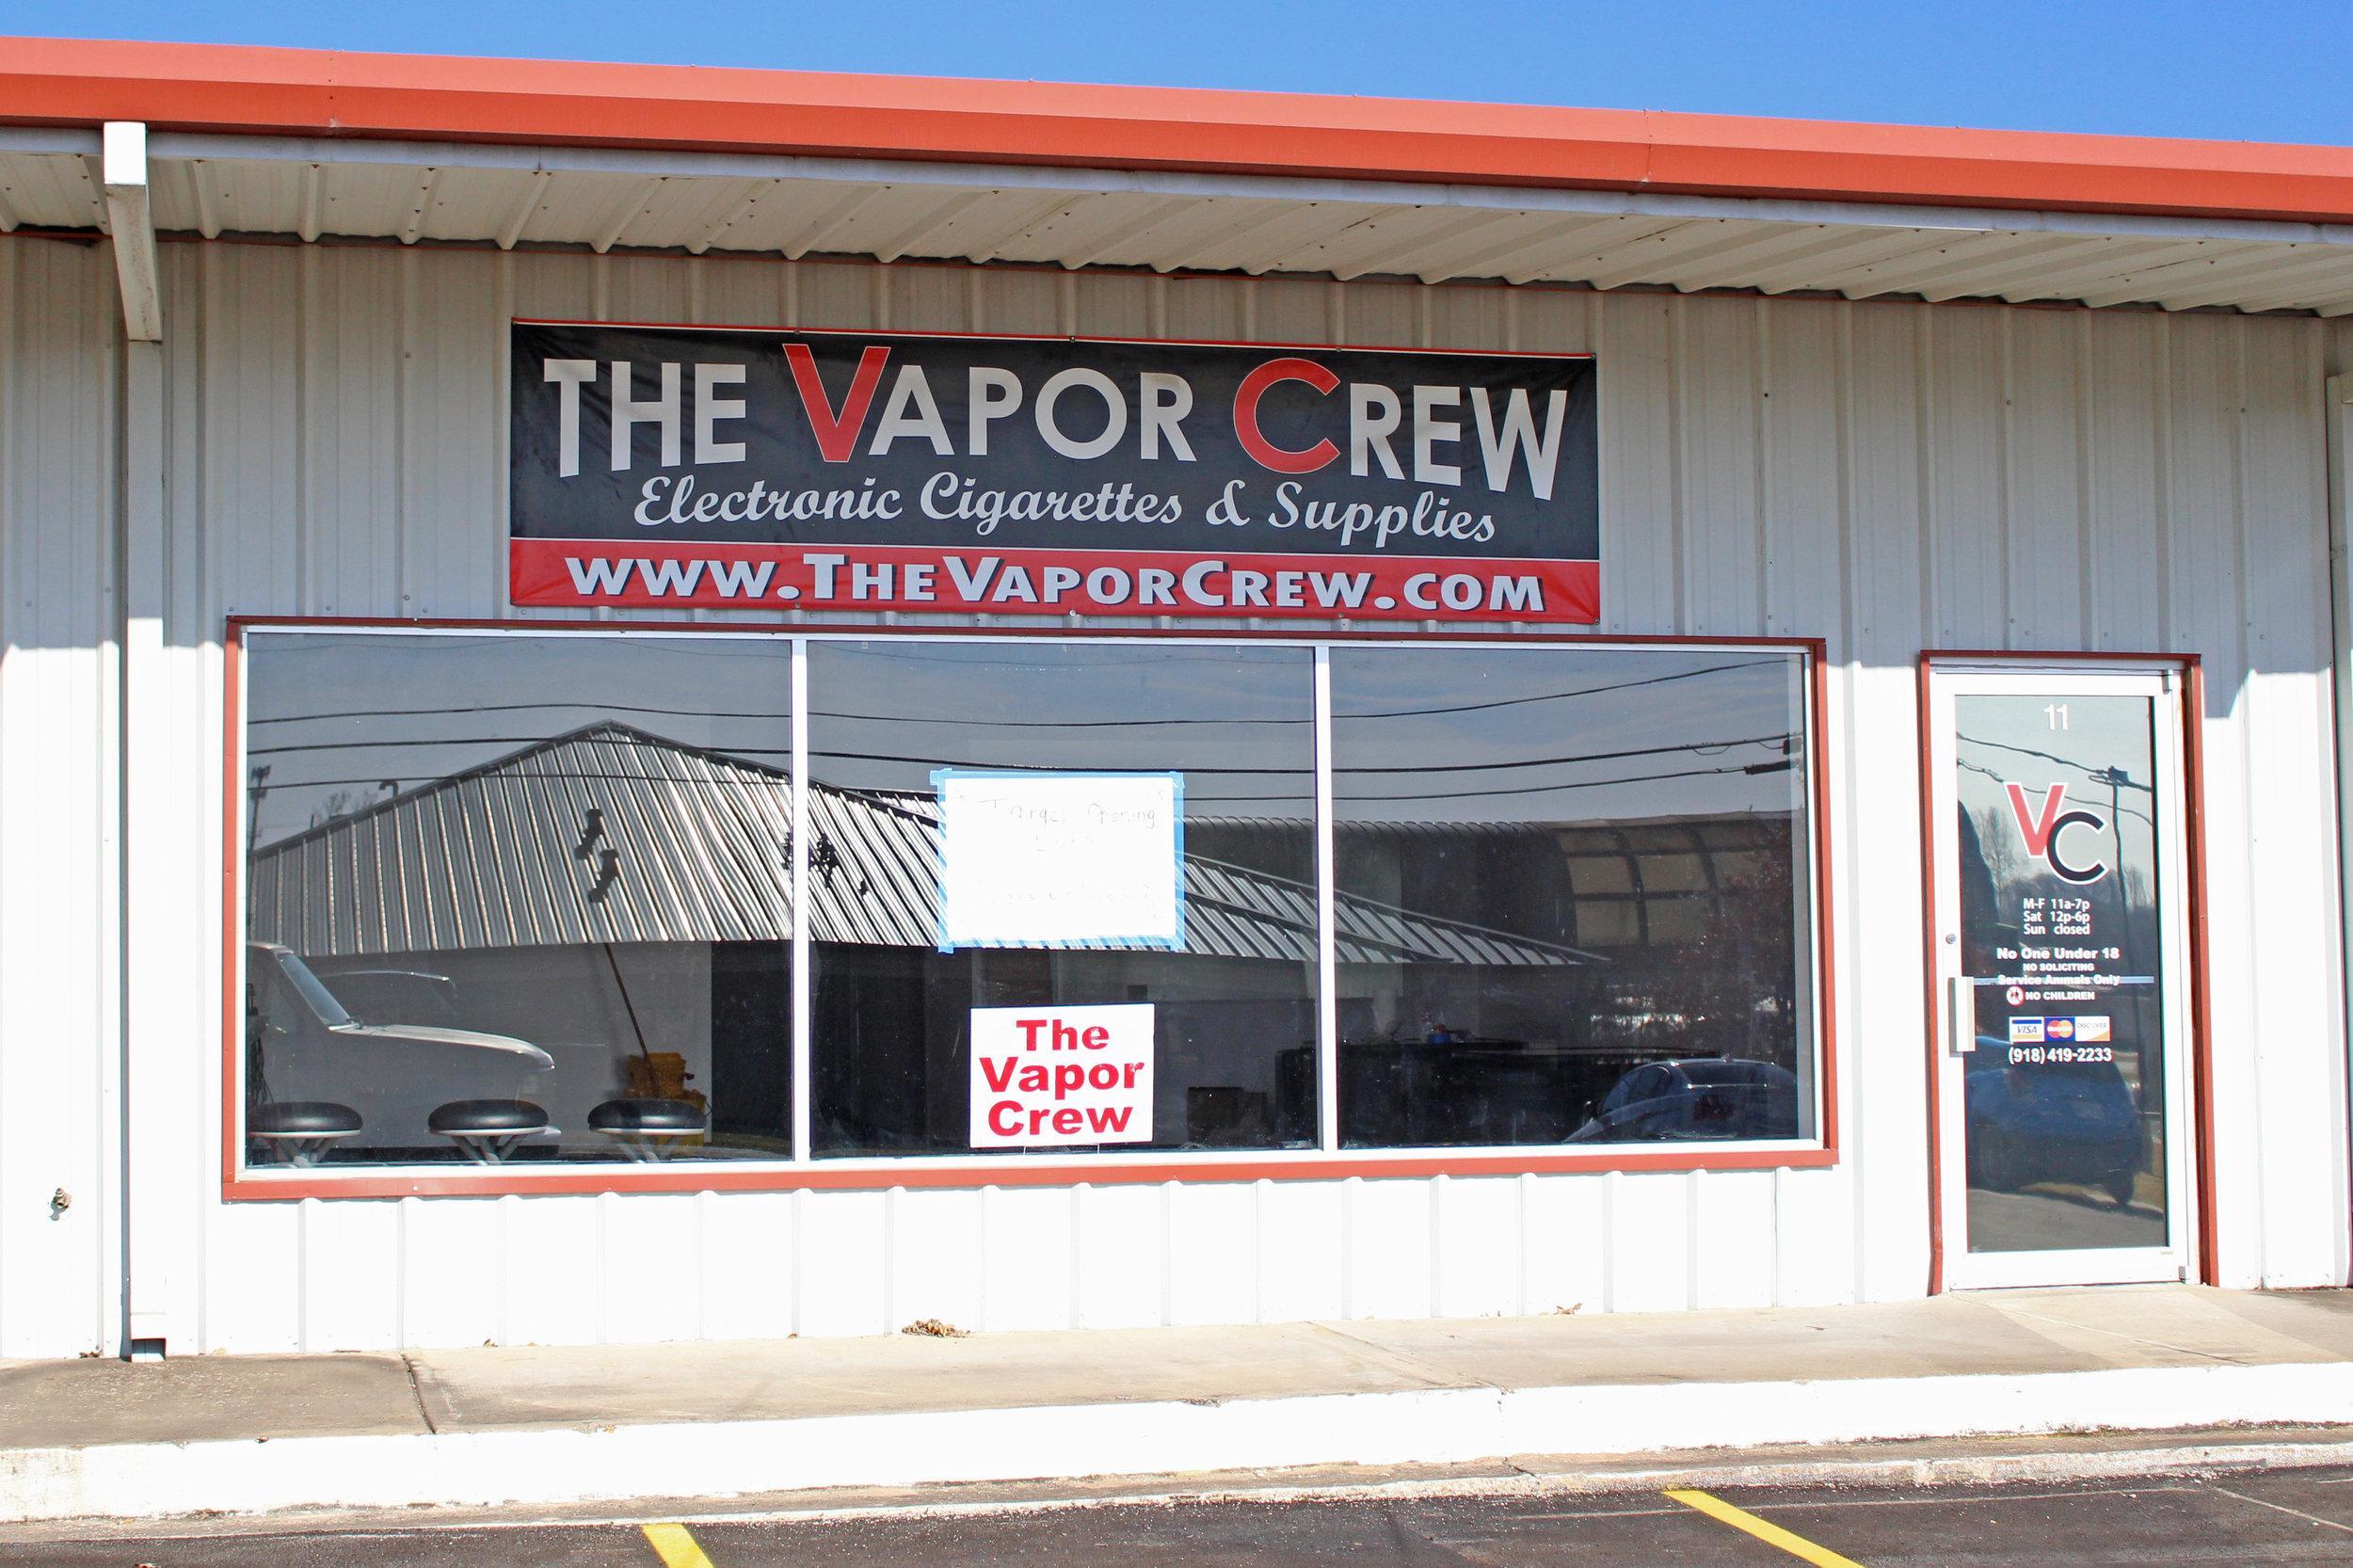 The Vapor Crew - Cox Center 11 East 34th street south